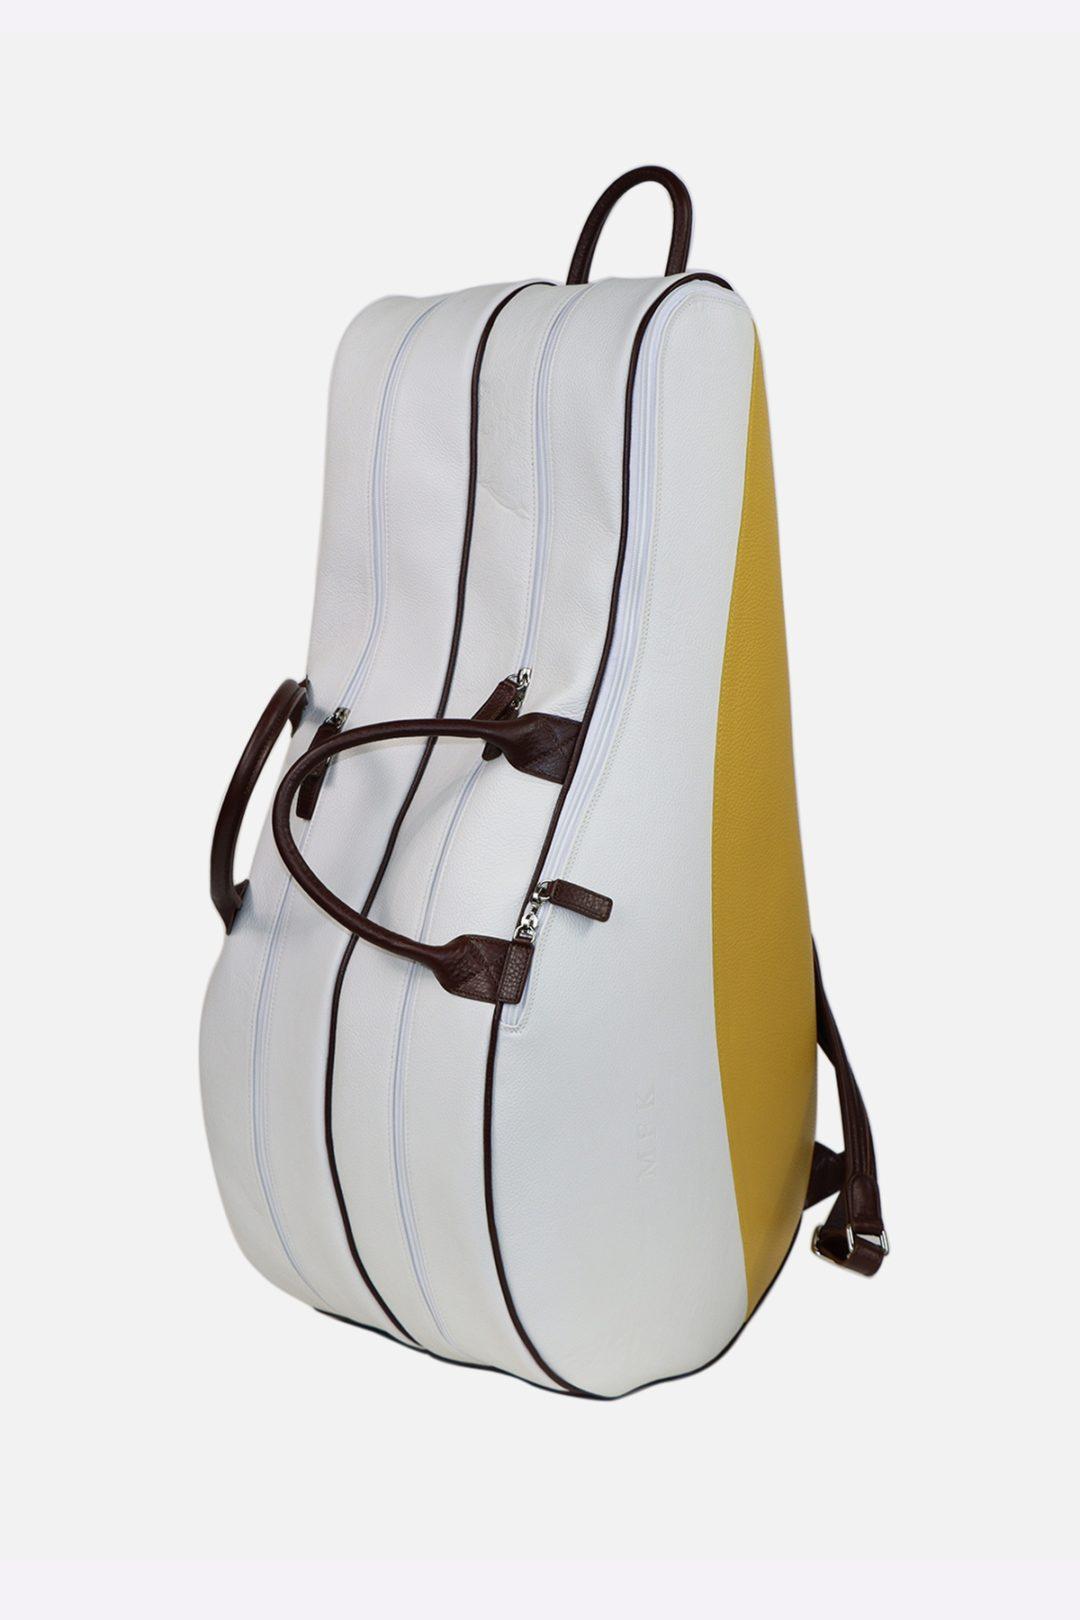 Classic Backpack Tennis Bag black leather waterproof handmade in italy